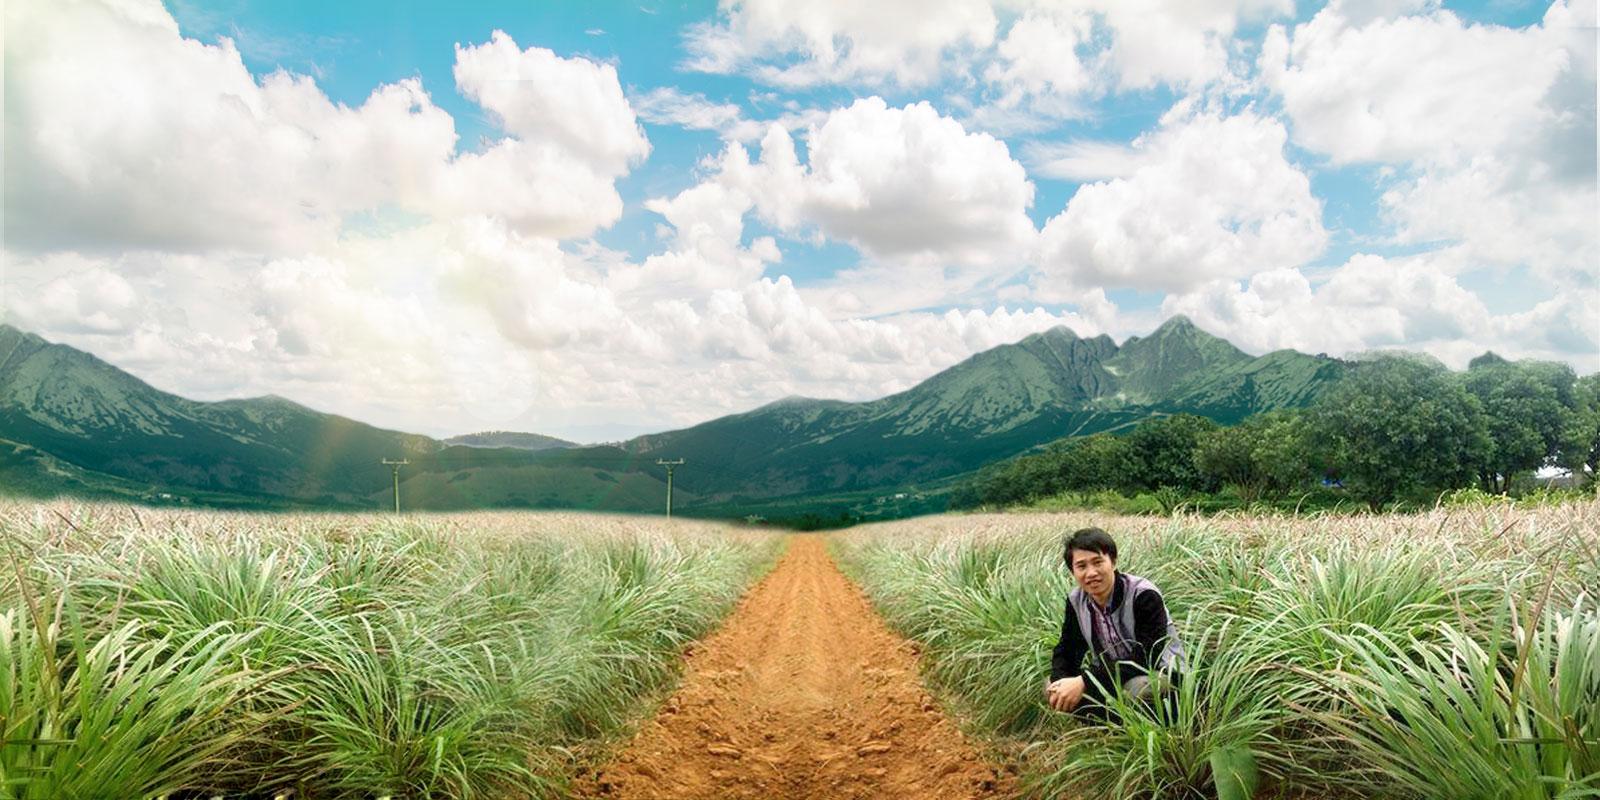 https://tinhdauloda.vn/tinh-dau-sa-chanh-nguyen-chat-lemon-grass-essential-oil